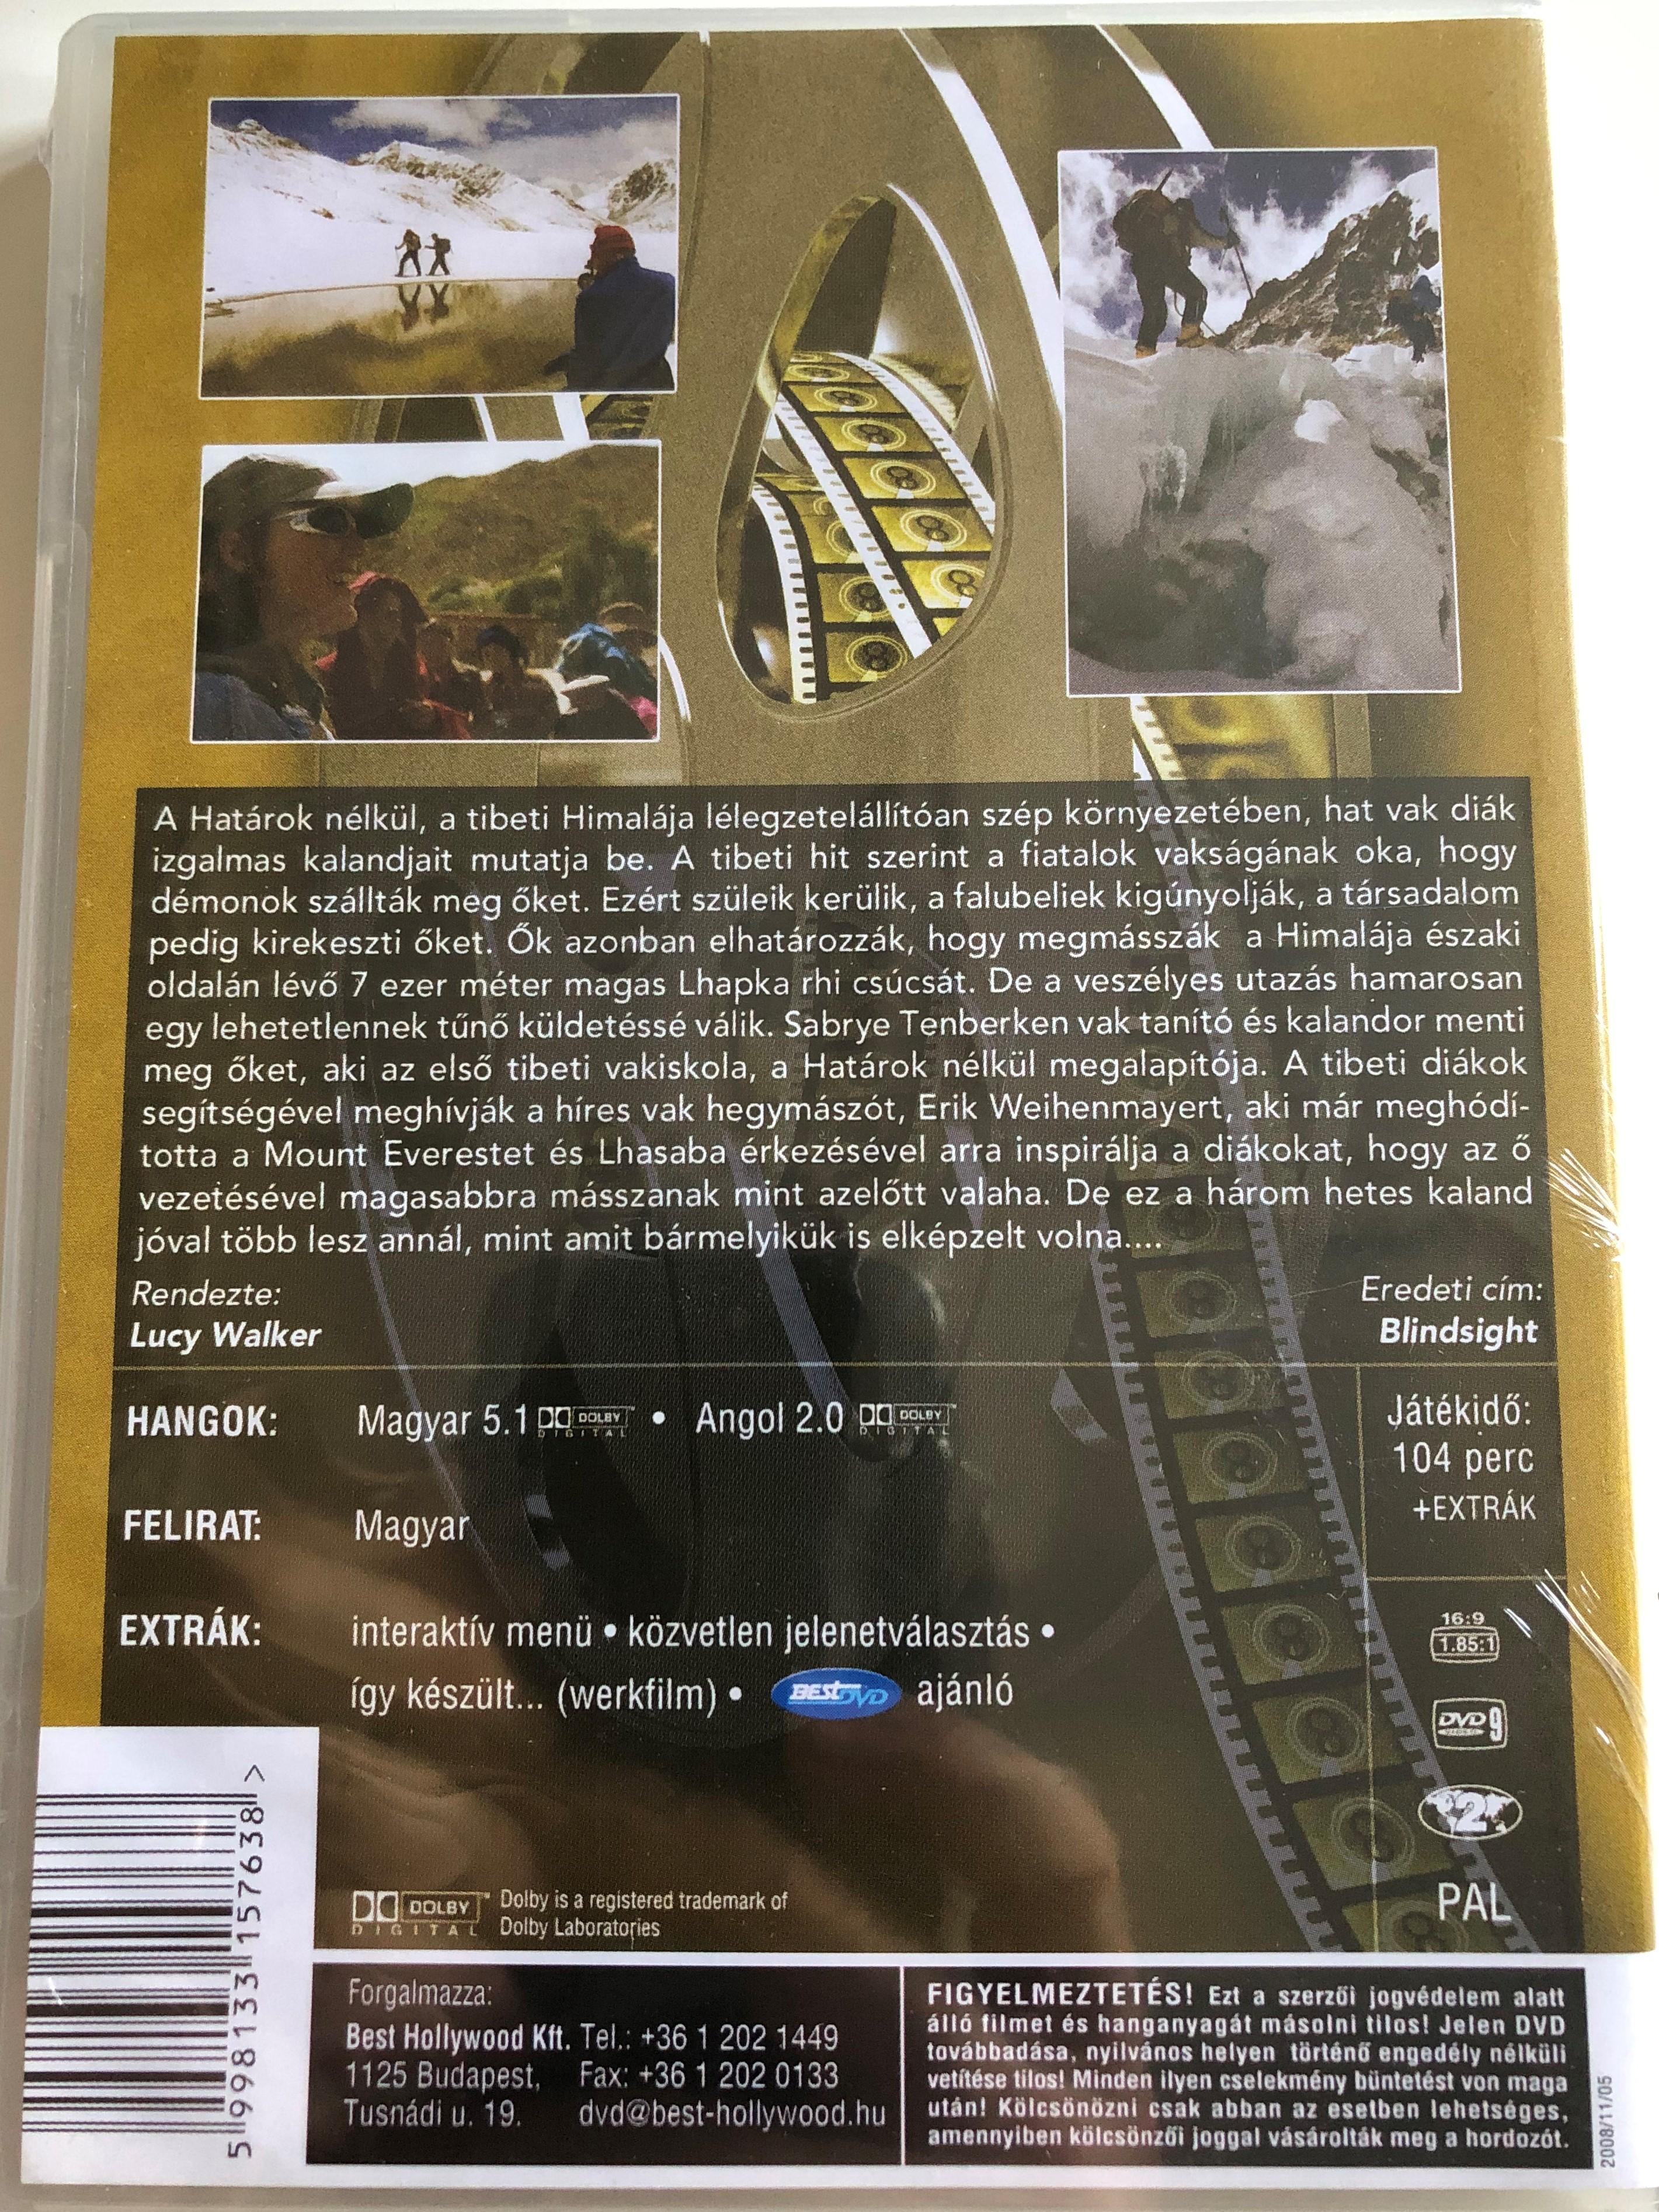 blindsight-dvd-2006-hat-rok-n-lk-l-vakon-a-mount-everesten-2.jpg